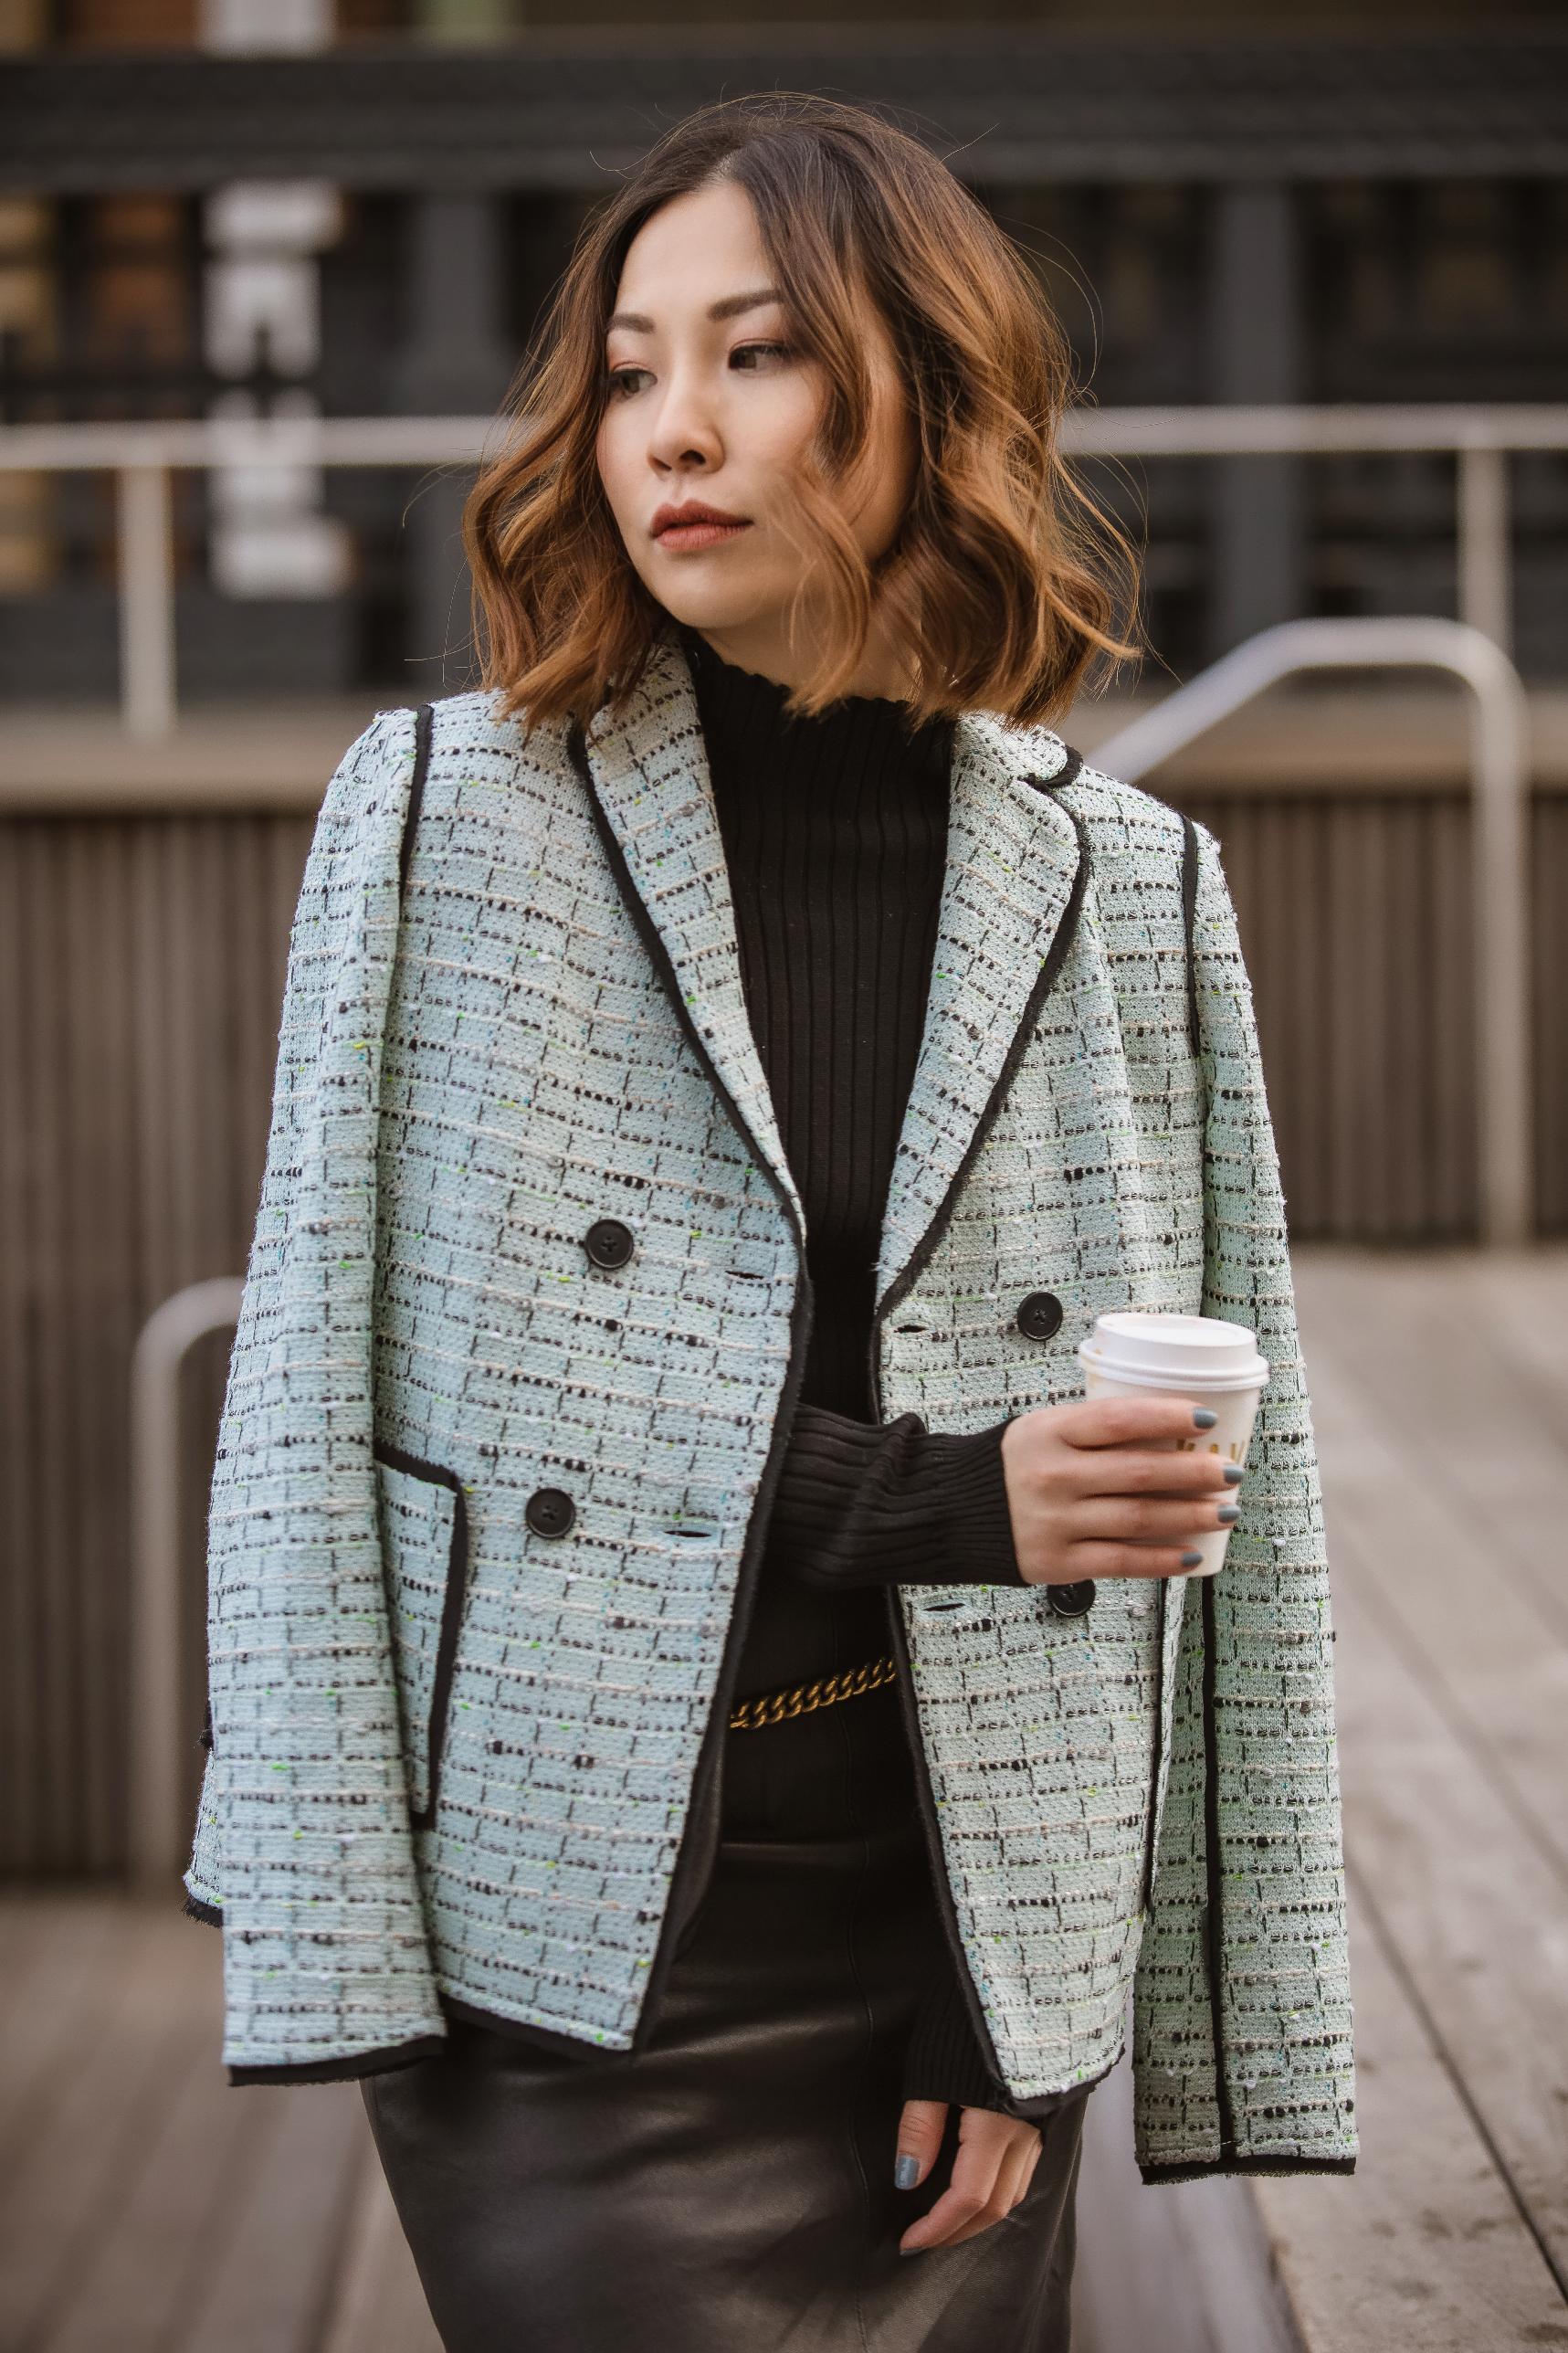 st john knits adriana multi tweed jacket spring 2018 collectino .JPG